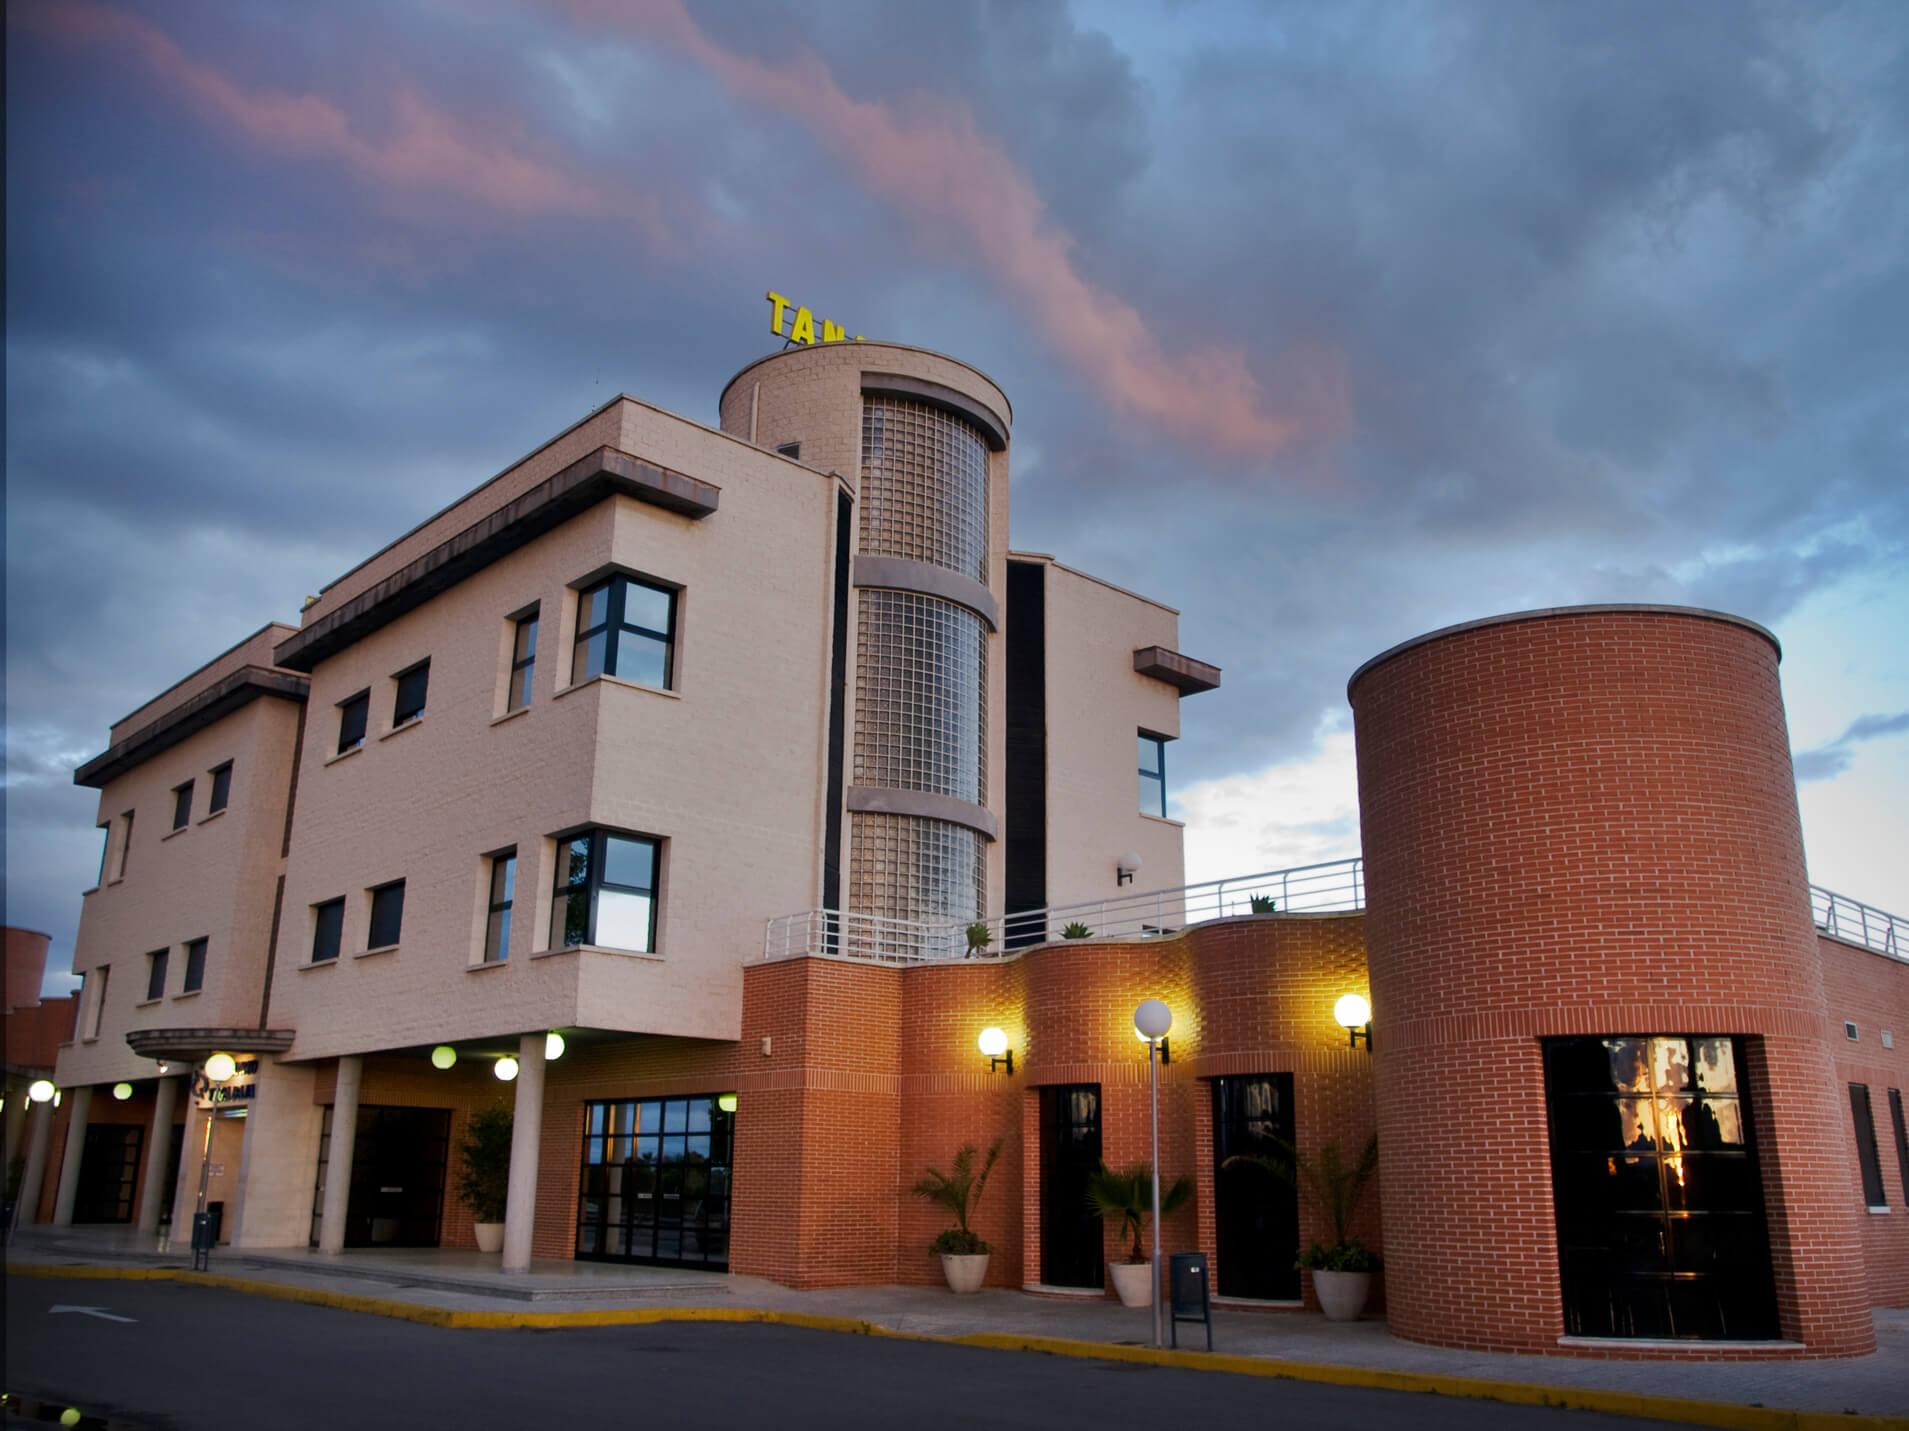 Tanatorio Crematorio Vega Baja